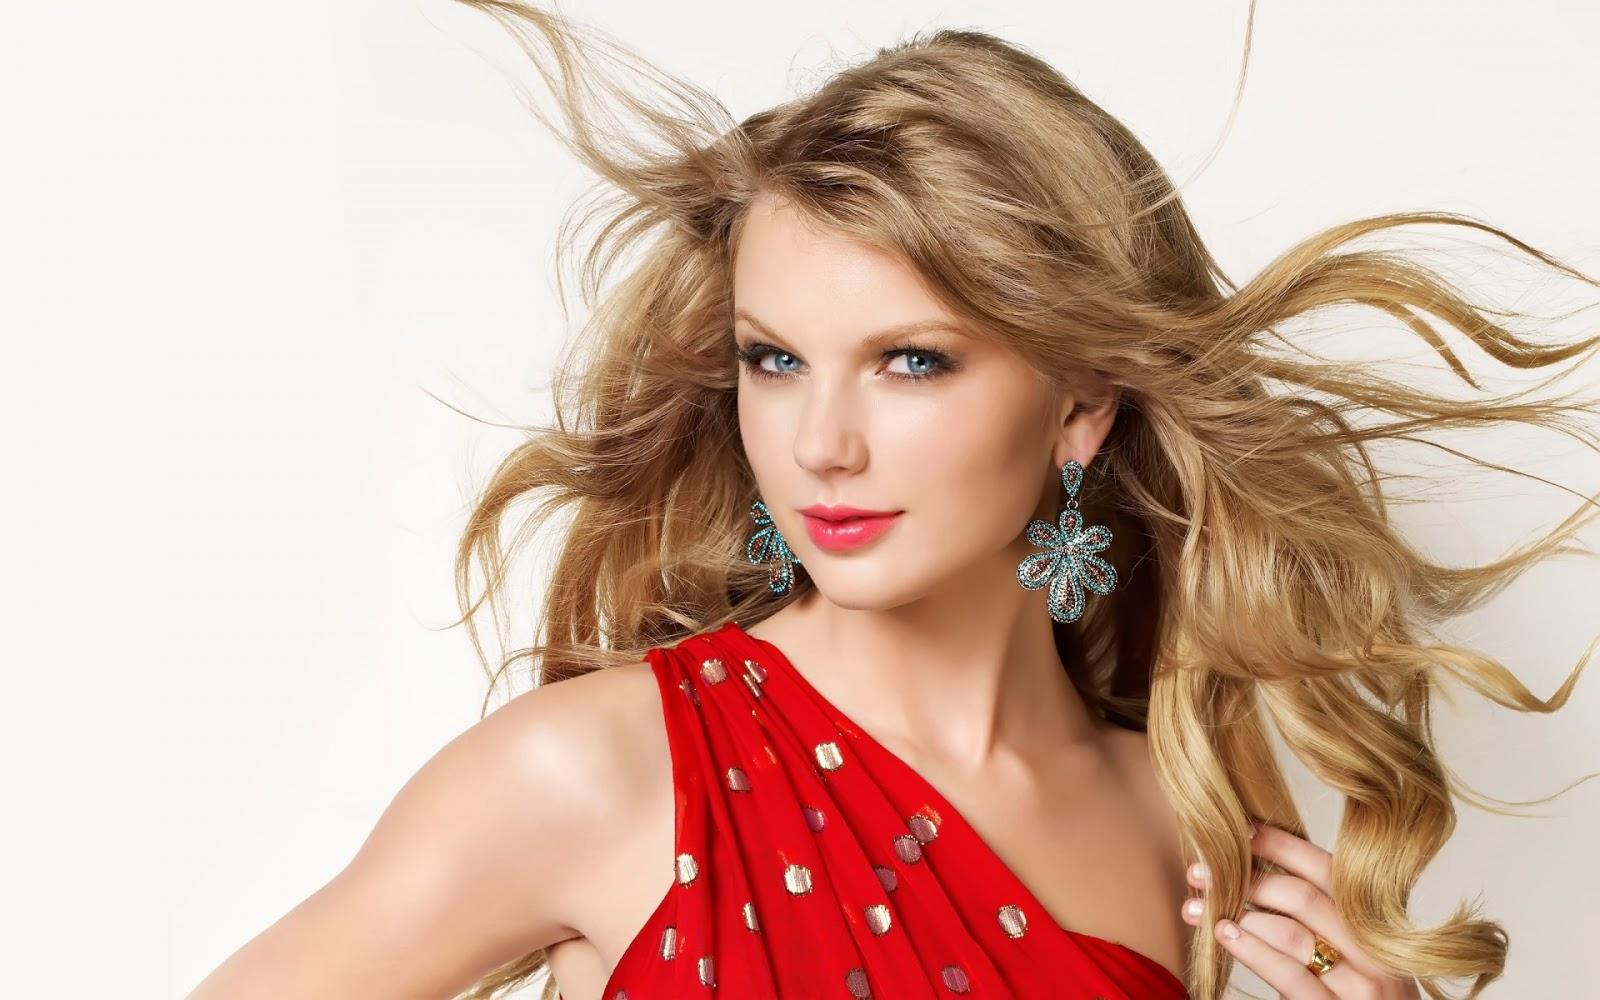 Taylor Swift Photoshoot HD Wallpaper